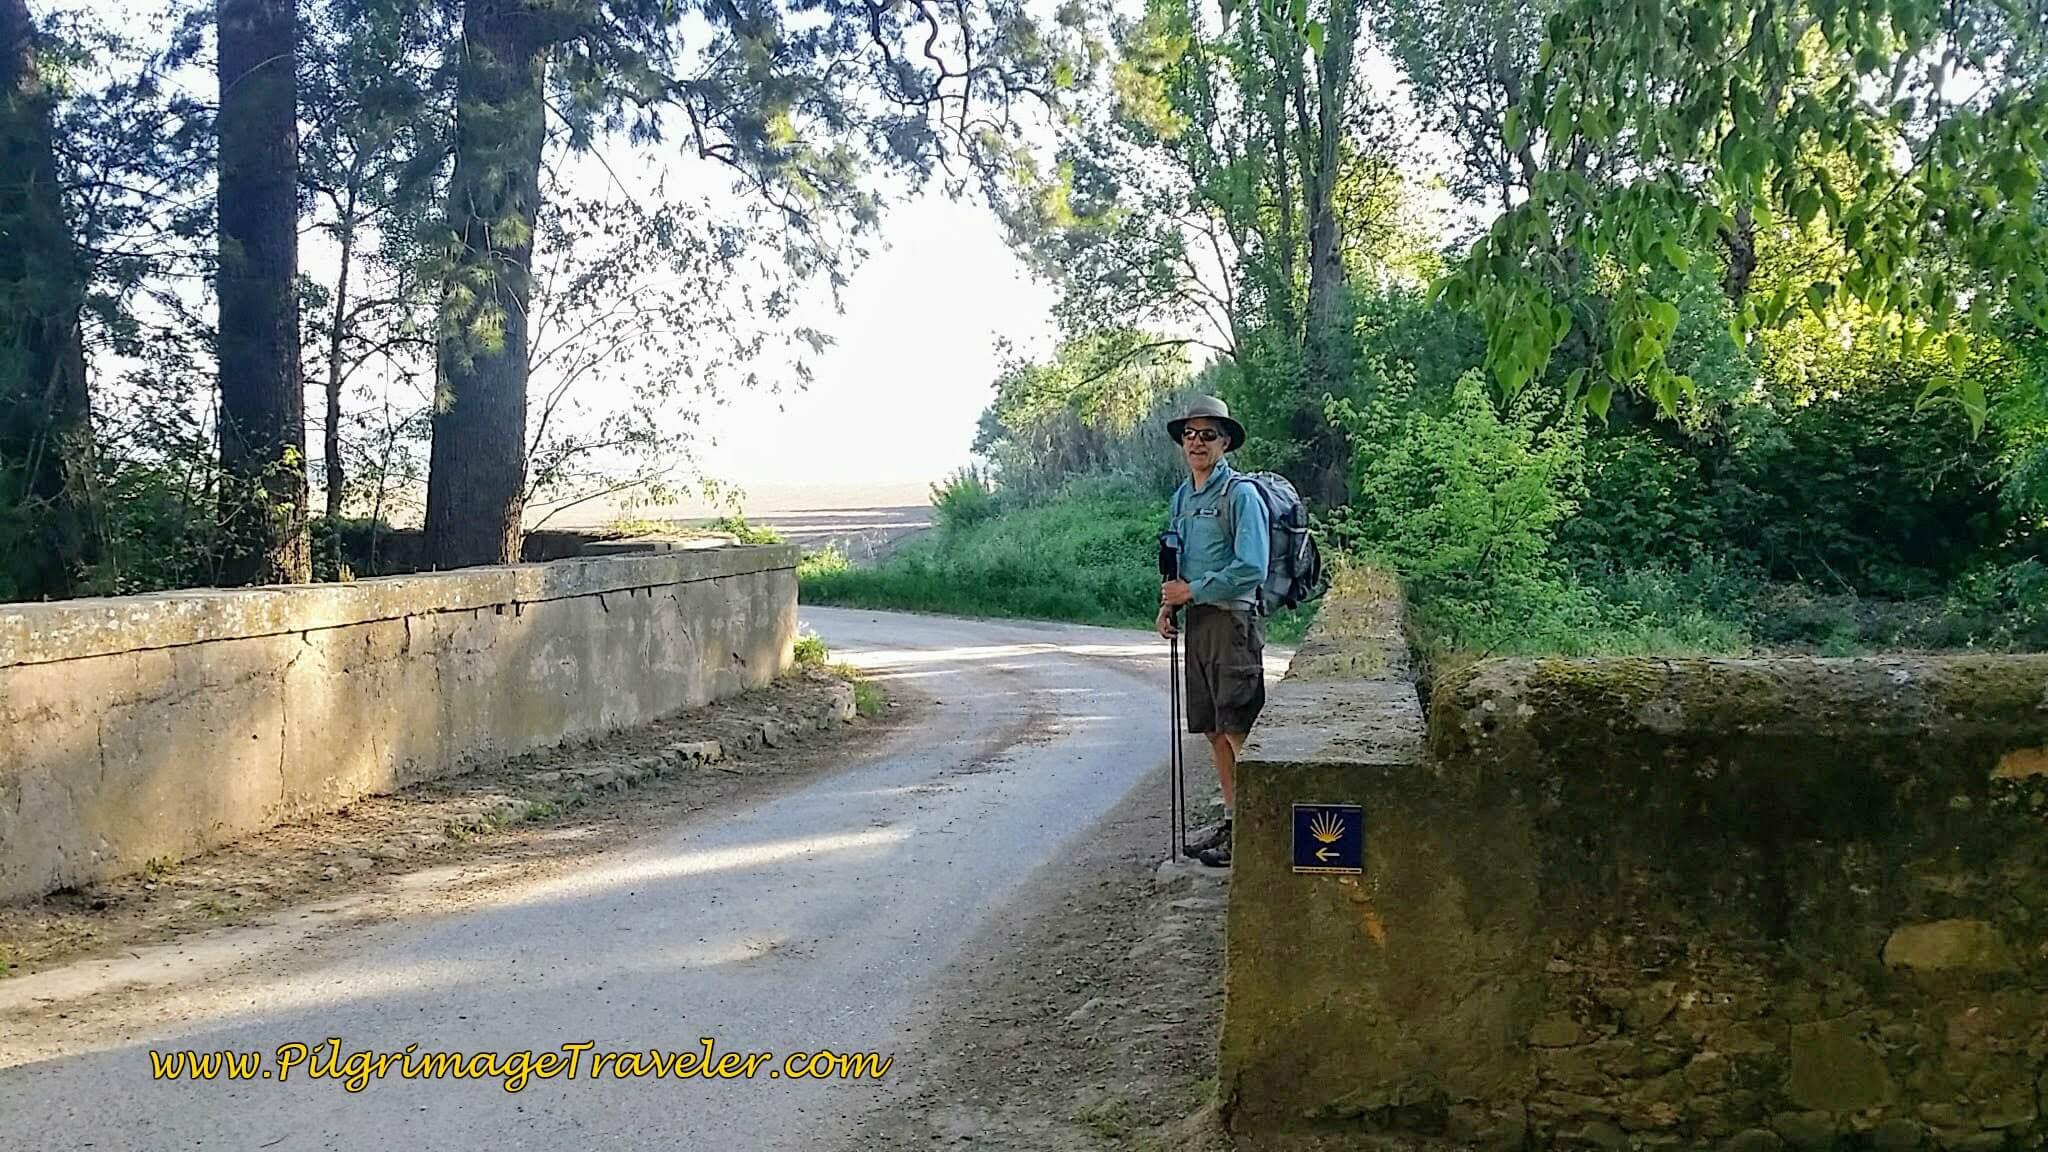 Leaving the Quinta da Cardiga and Re-entering the Sunny Portuguese Countryside